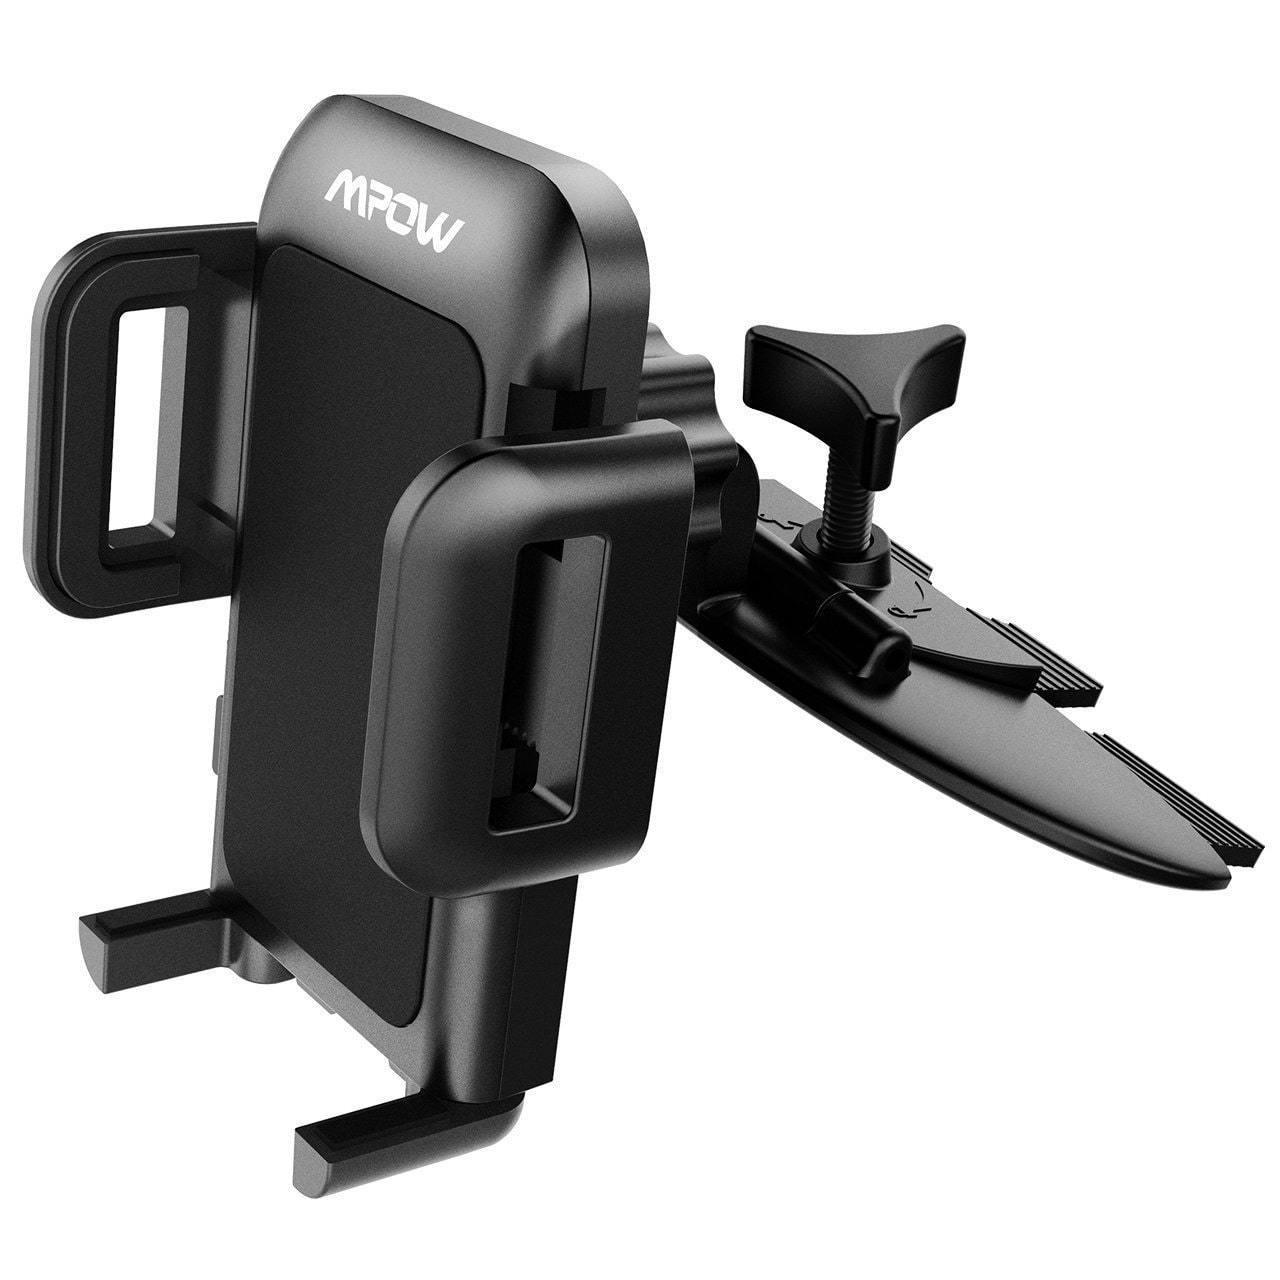 Mpow-Grip-Pro-2-Universal-CD-Slot-360-Degree-Rotation-Air thumbnail 7